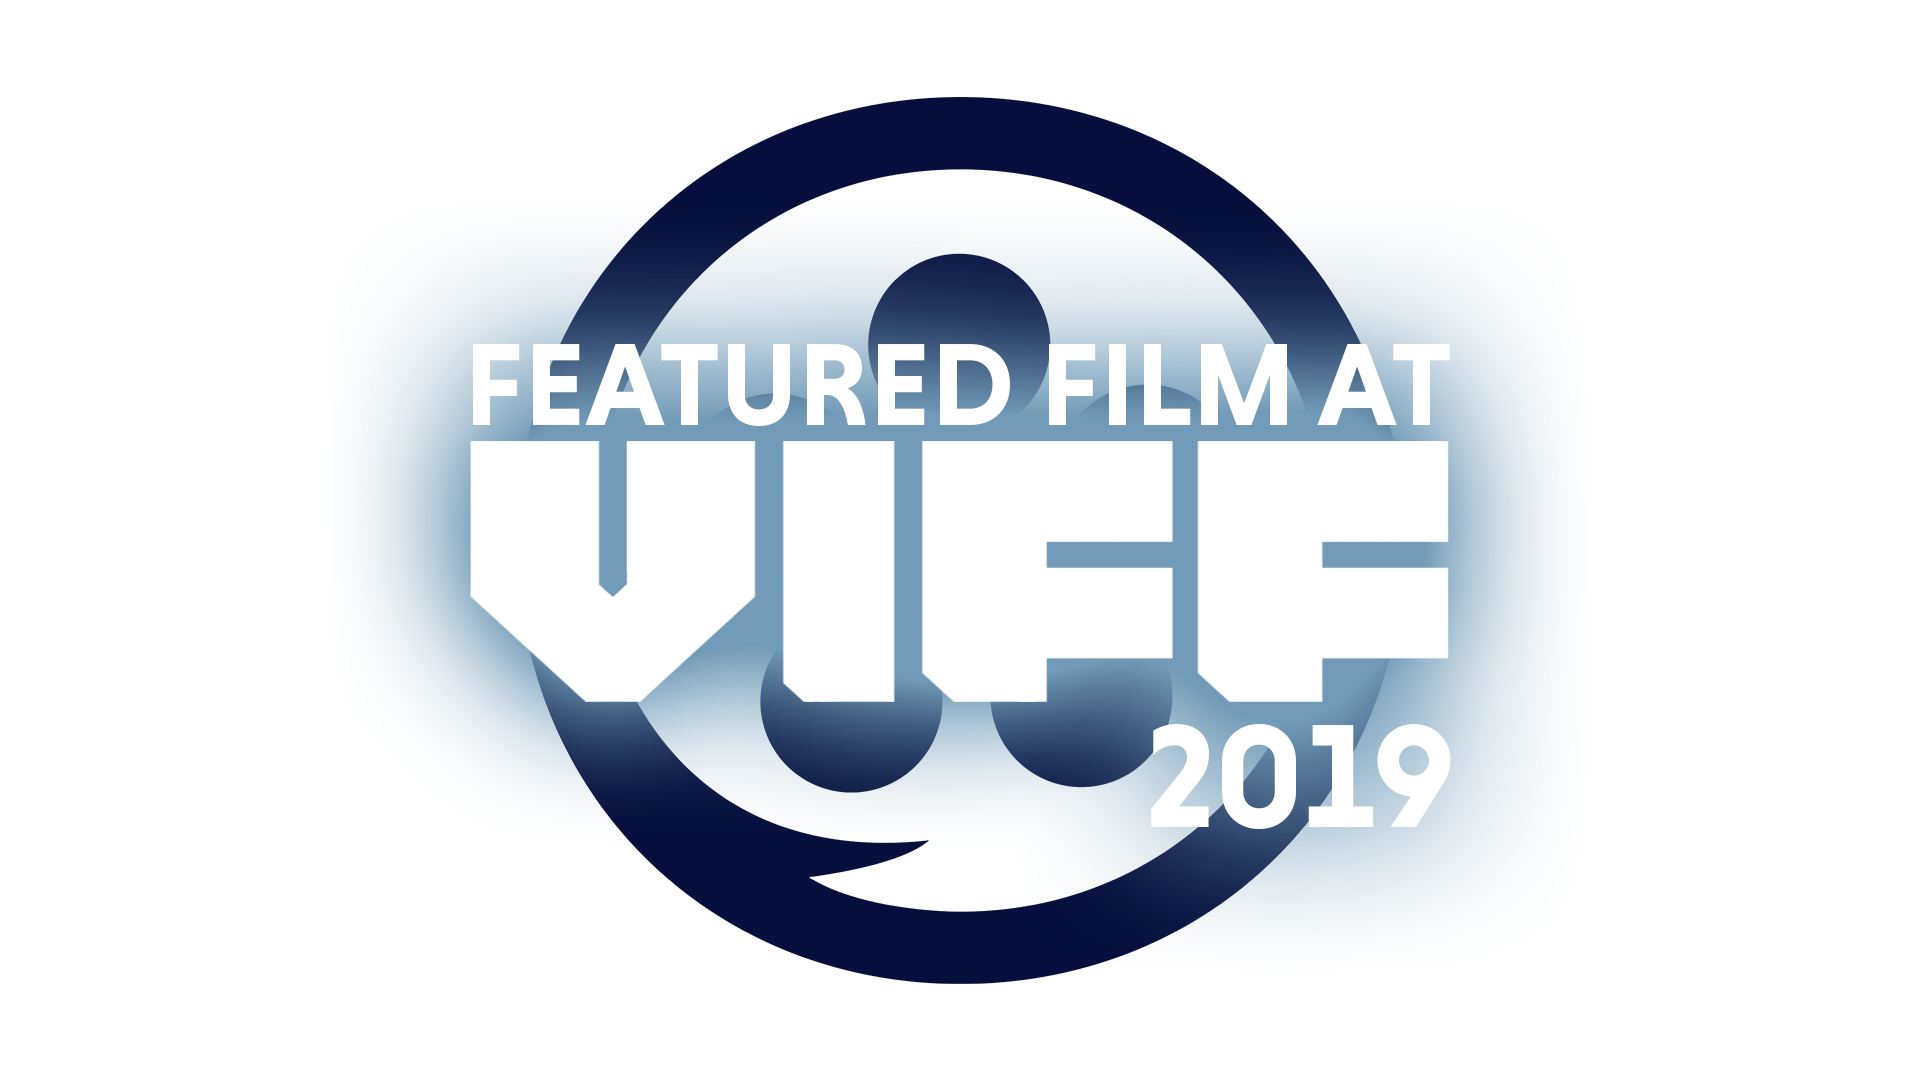 FeaturedIcon-VIFF2019.png